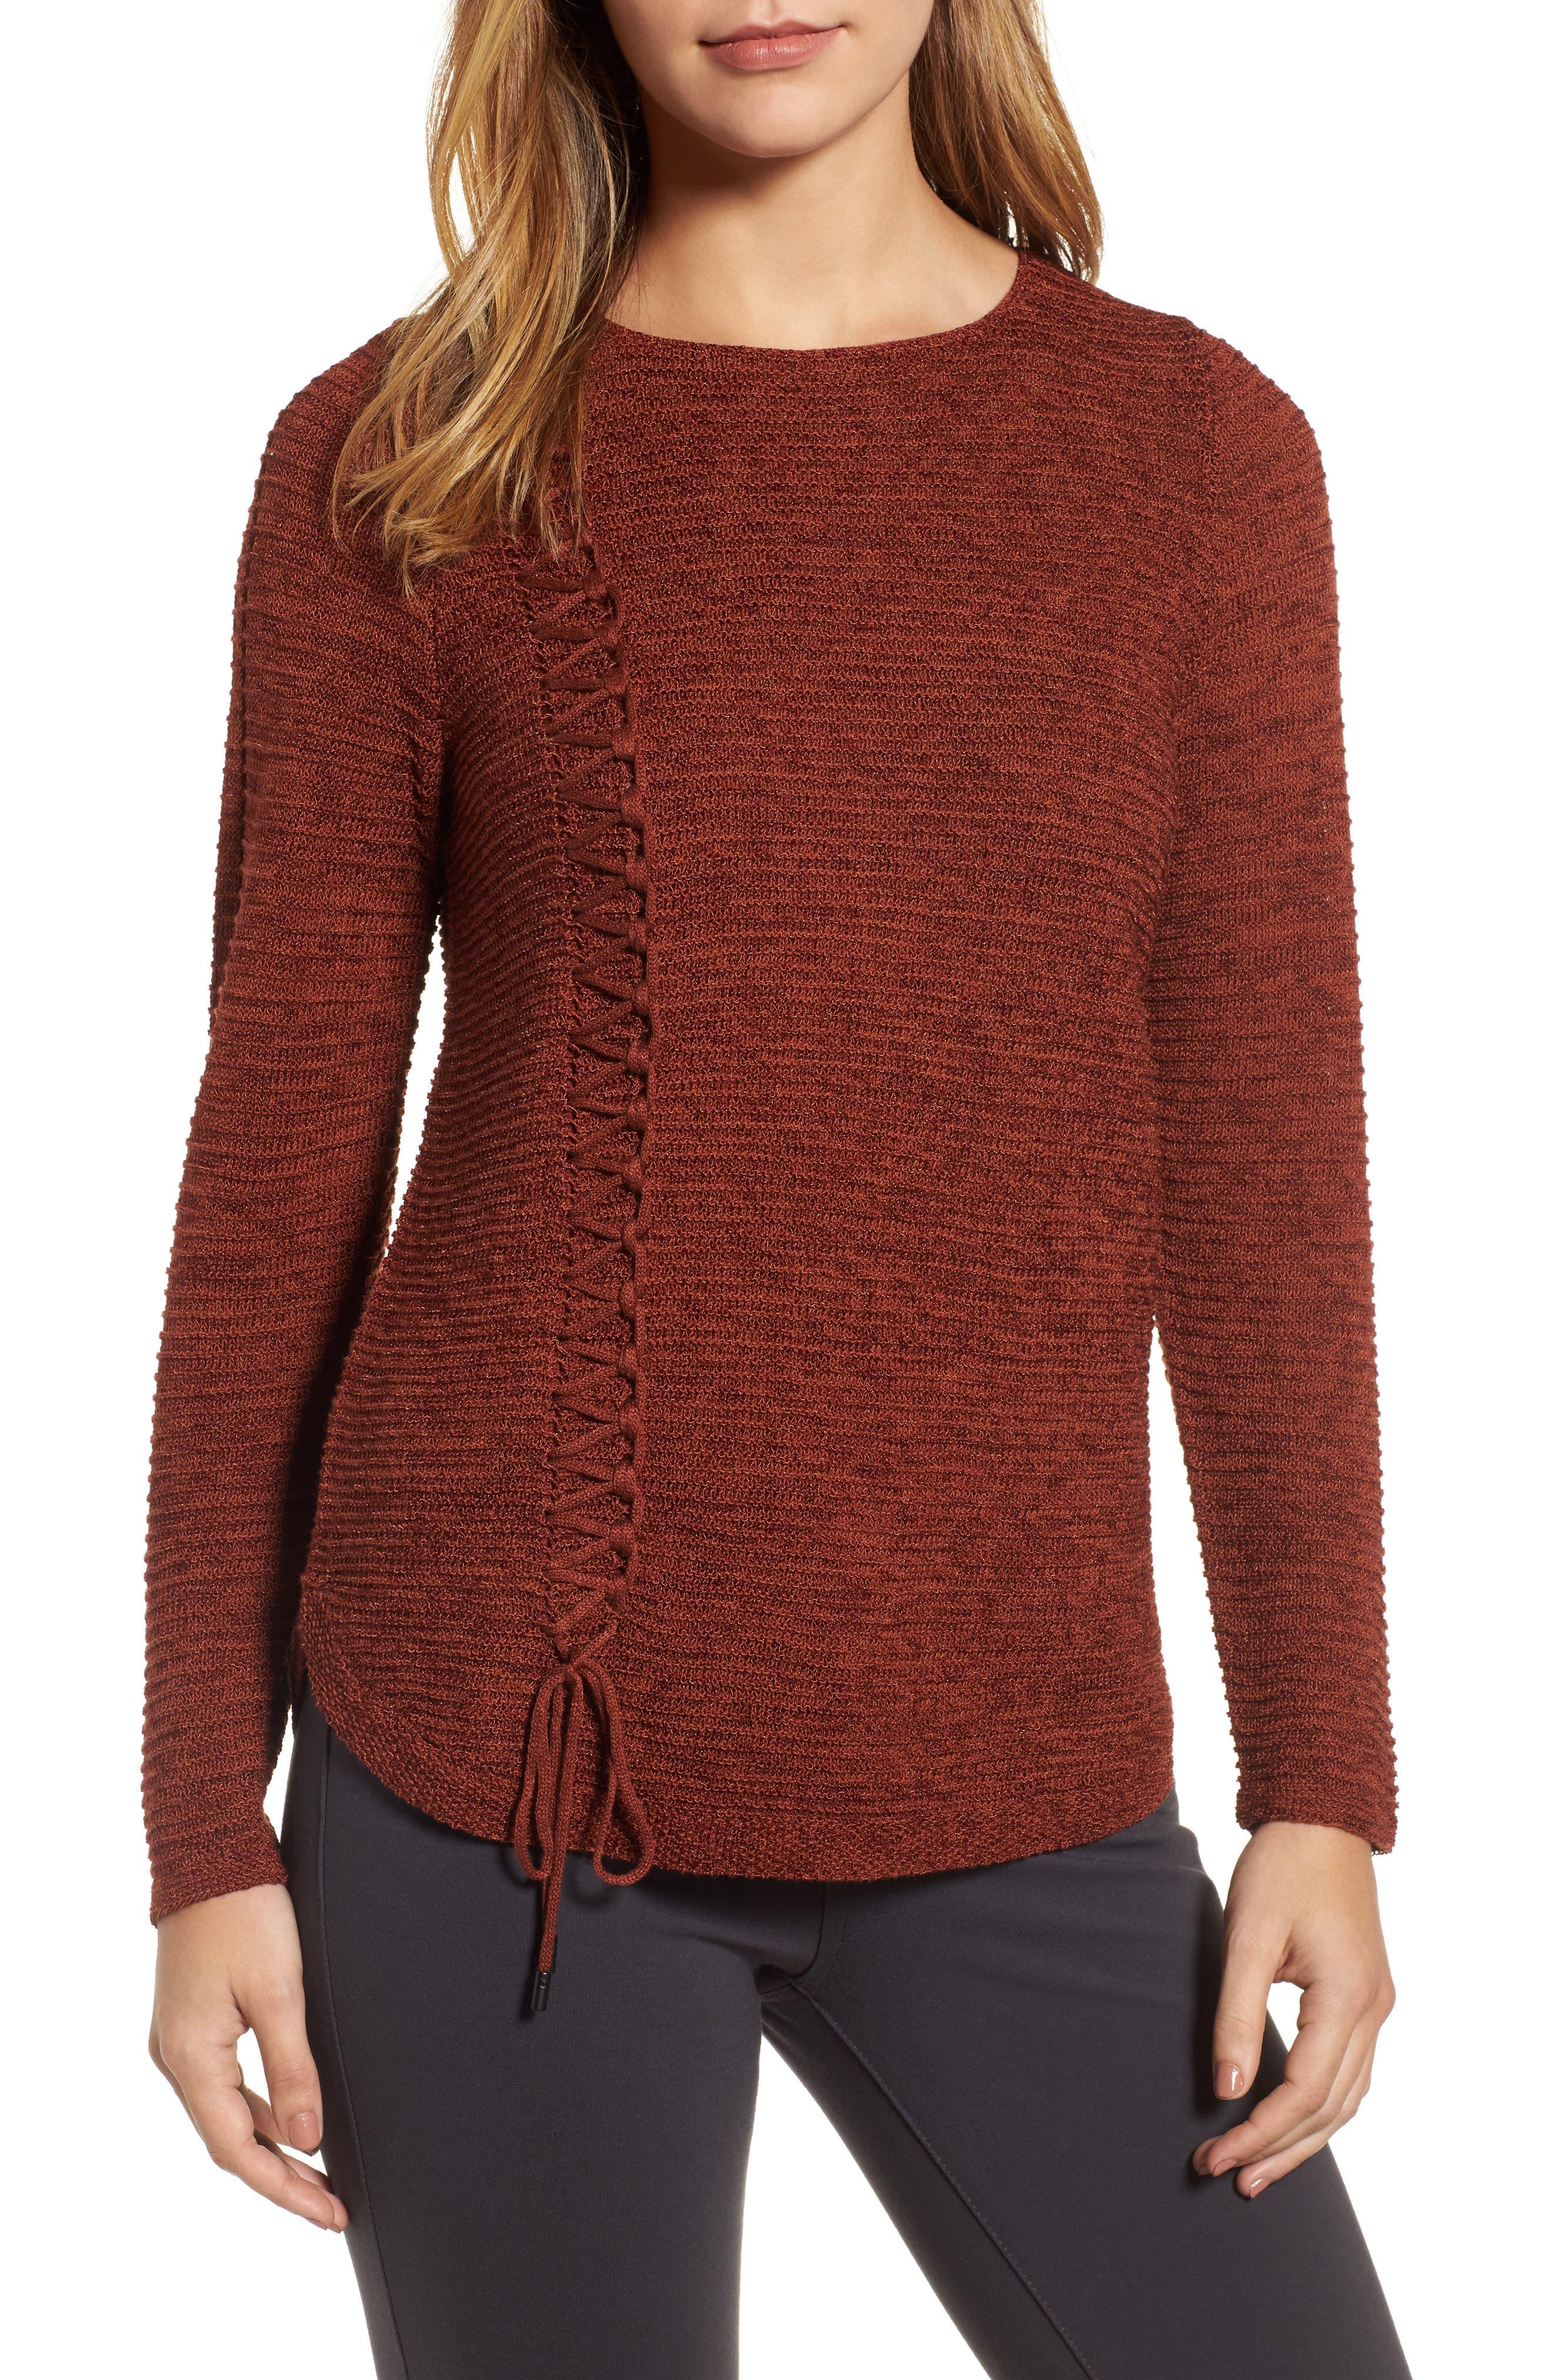 Alternate Image 1 Selected - NIC+ZOE Braided Up Sweater (Regular & Petite)